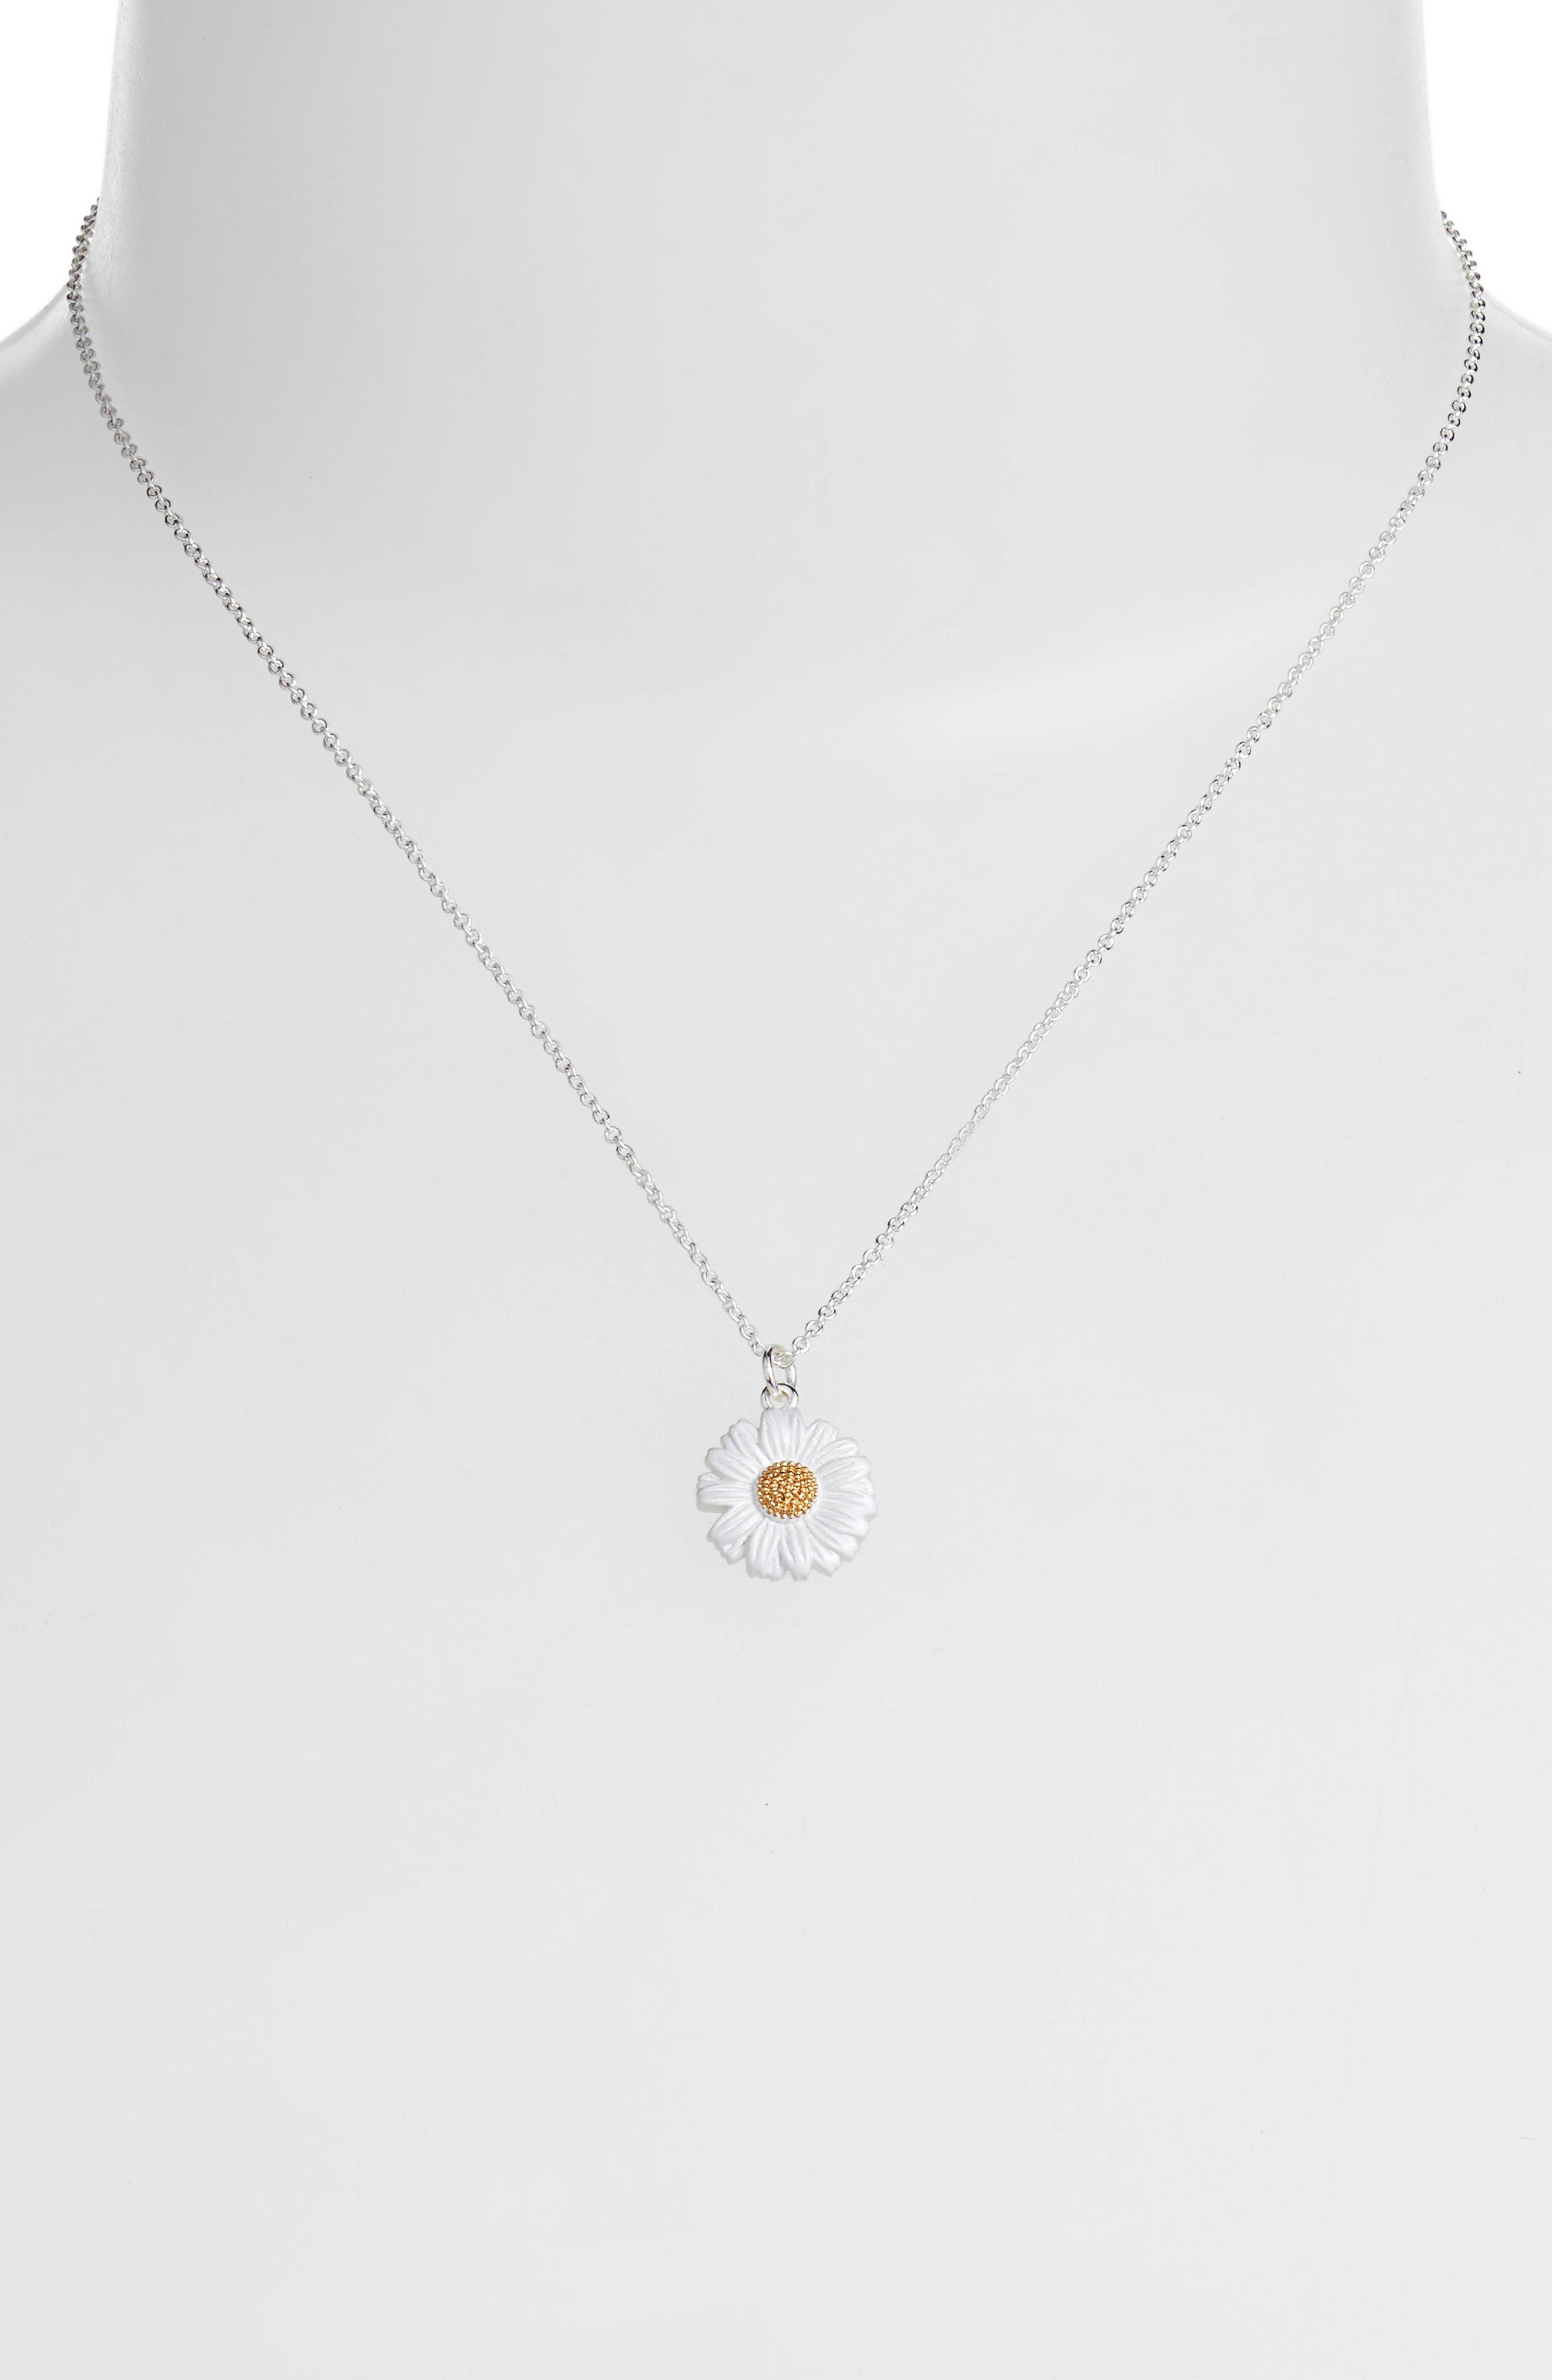 3D Daisy Pendant Necklace,                             Alternate thumbnail 2, color,                             SILVER/ GOLD